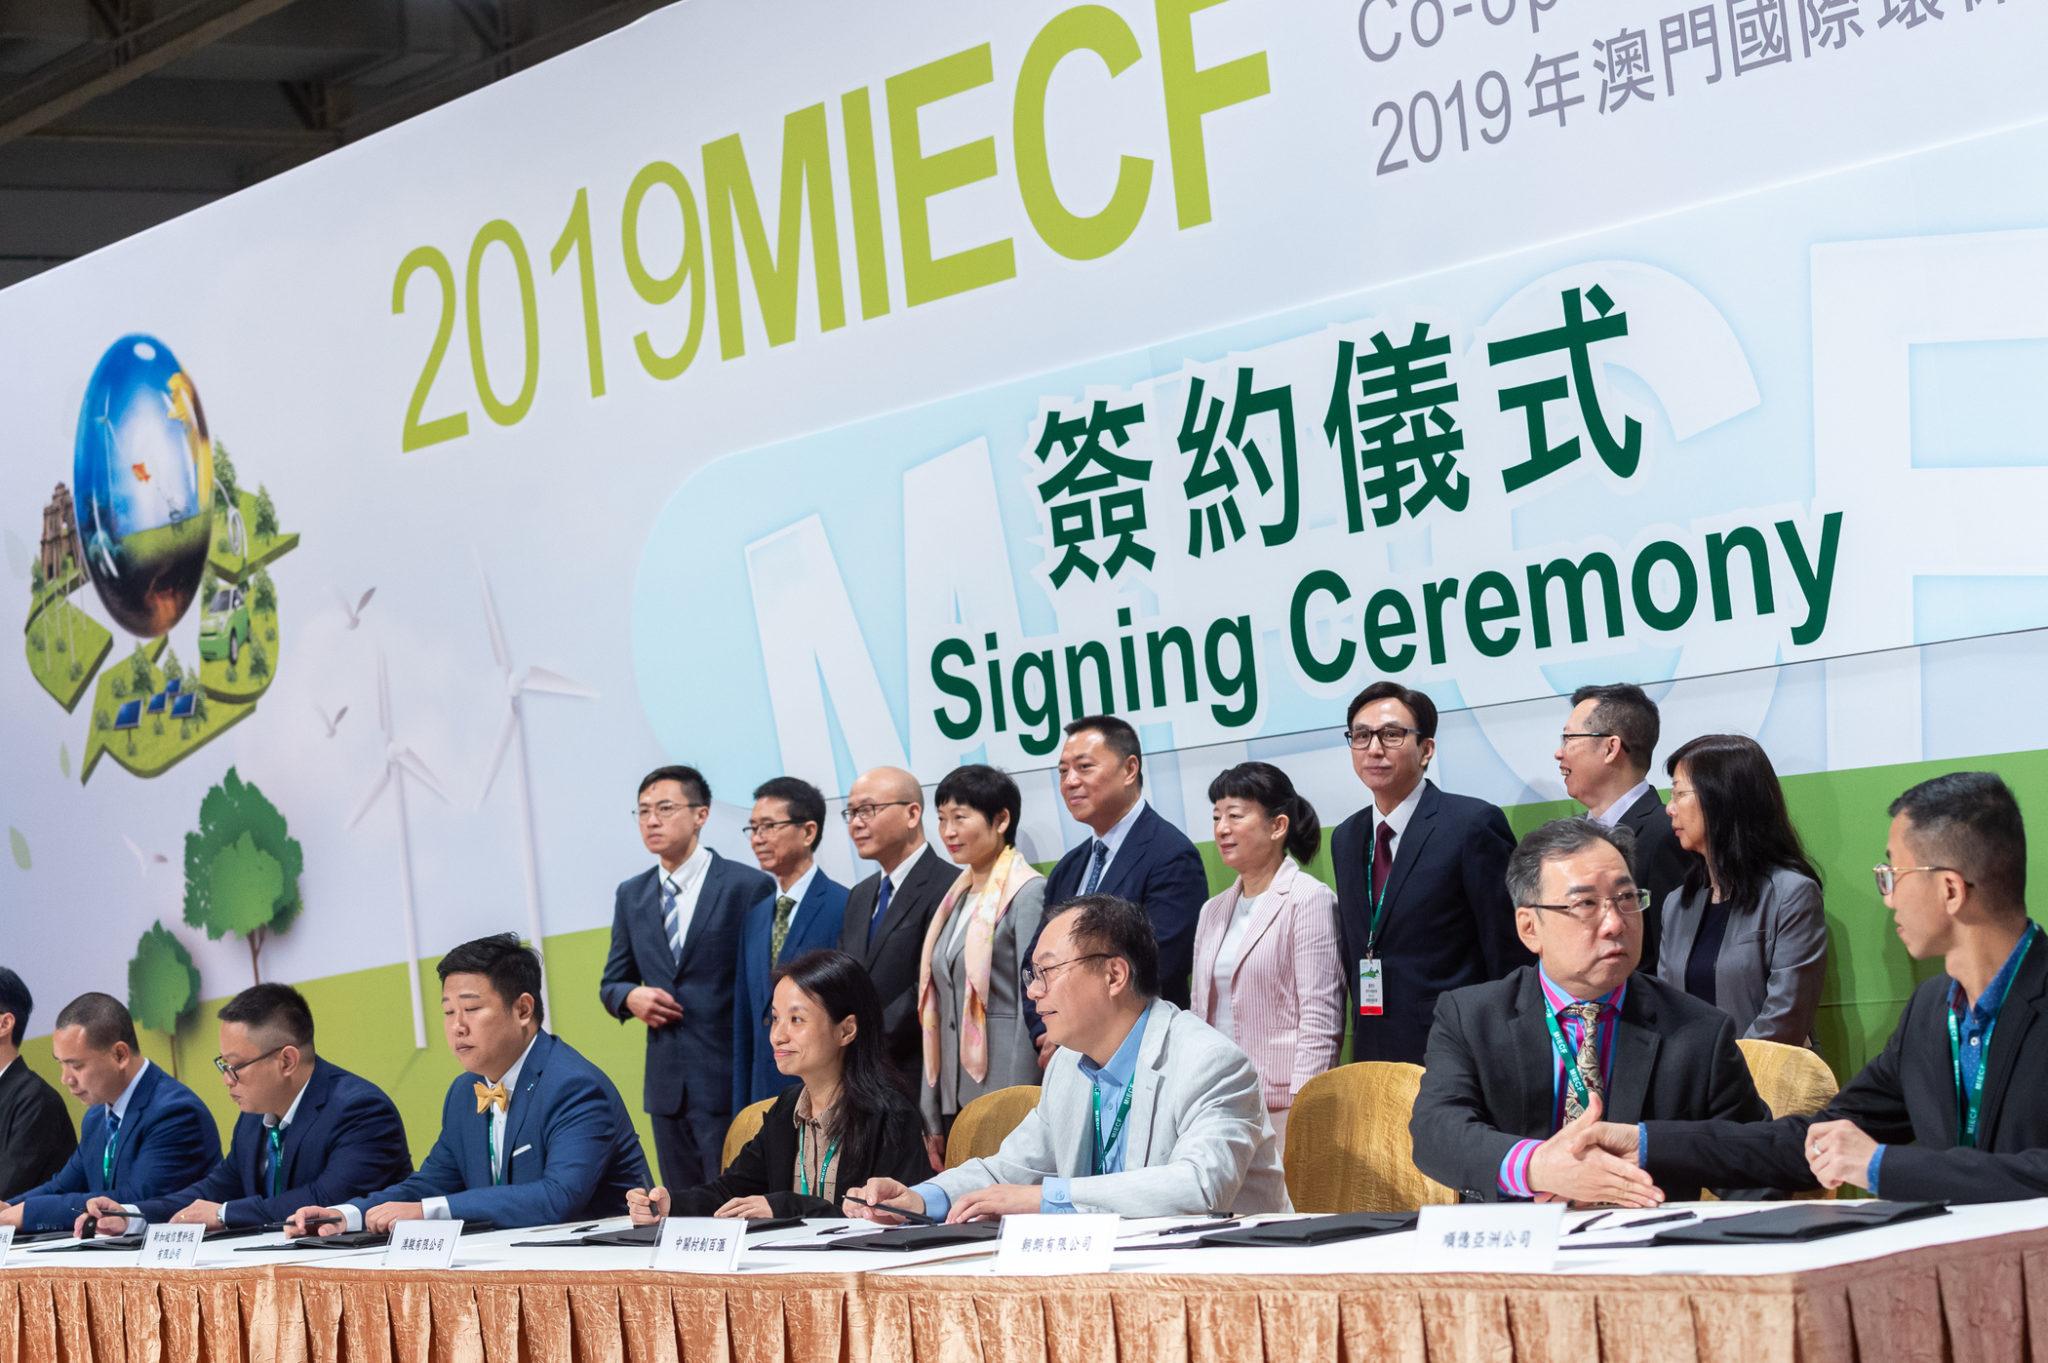 Especialistas defendem que Macau financie indústrias sustentáveis nos países lusófonos